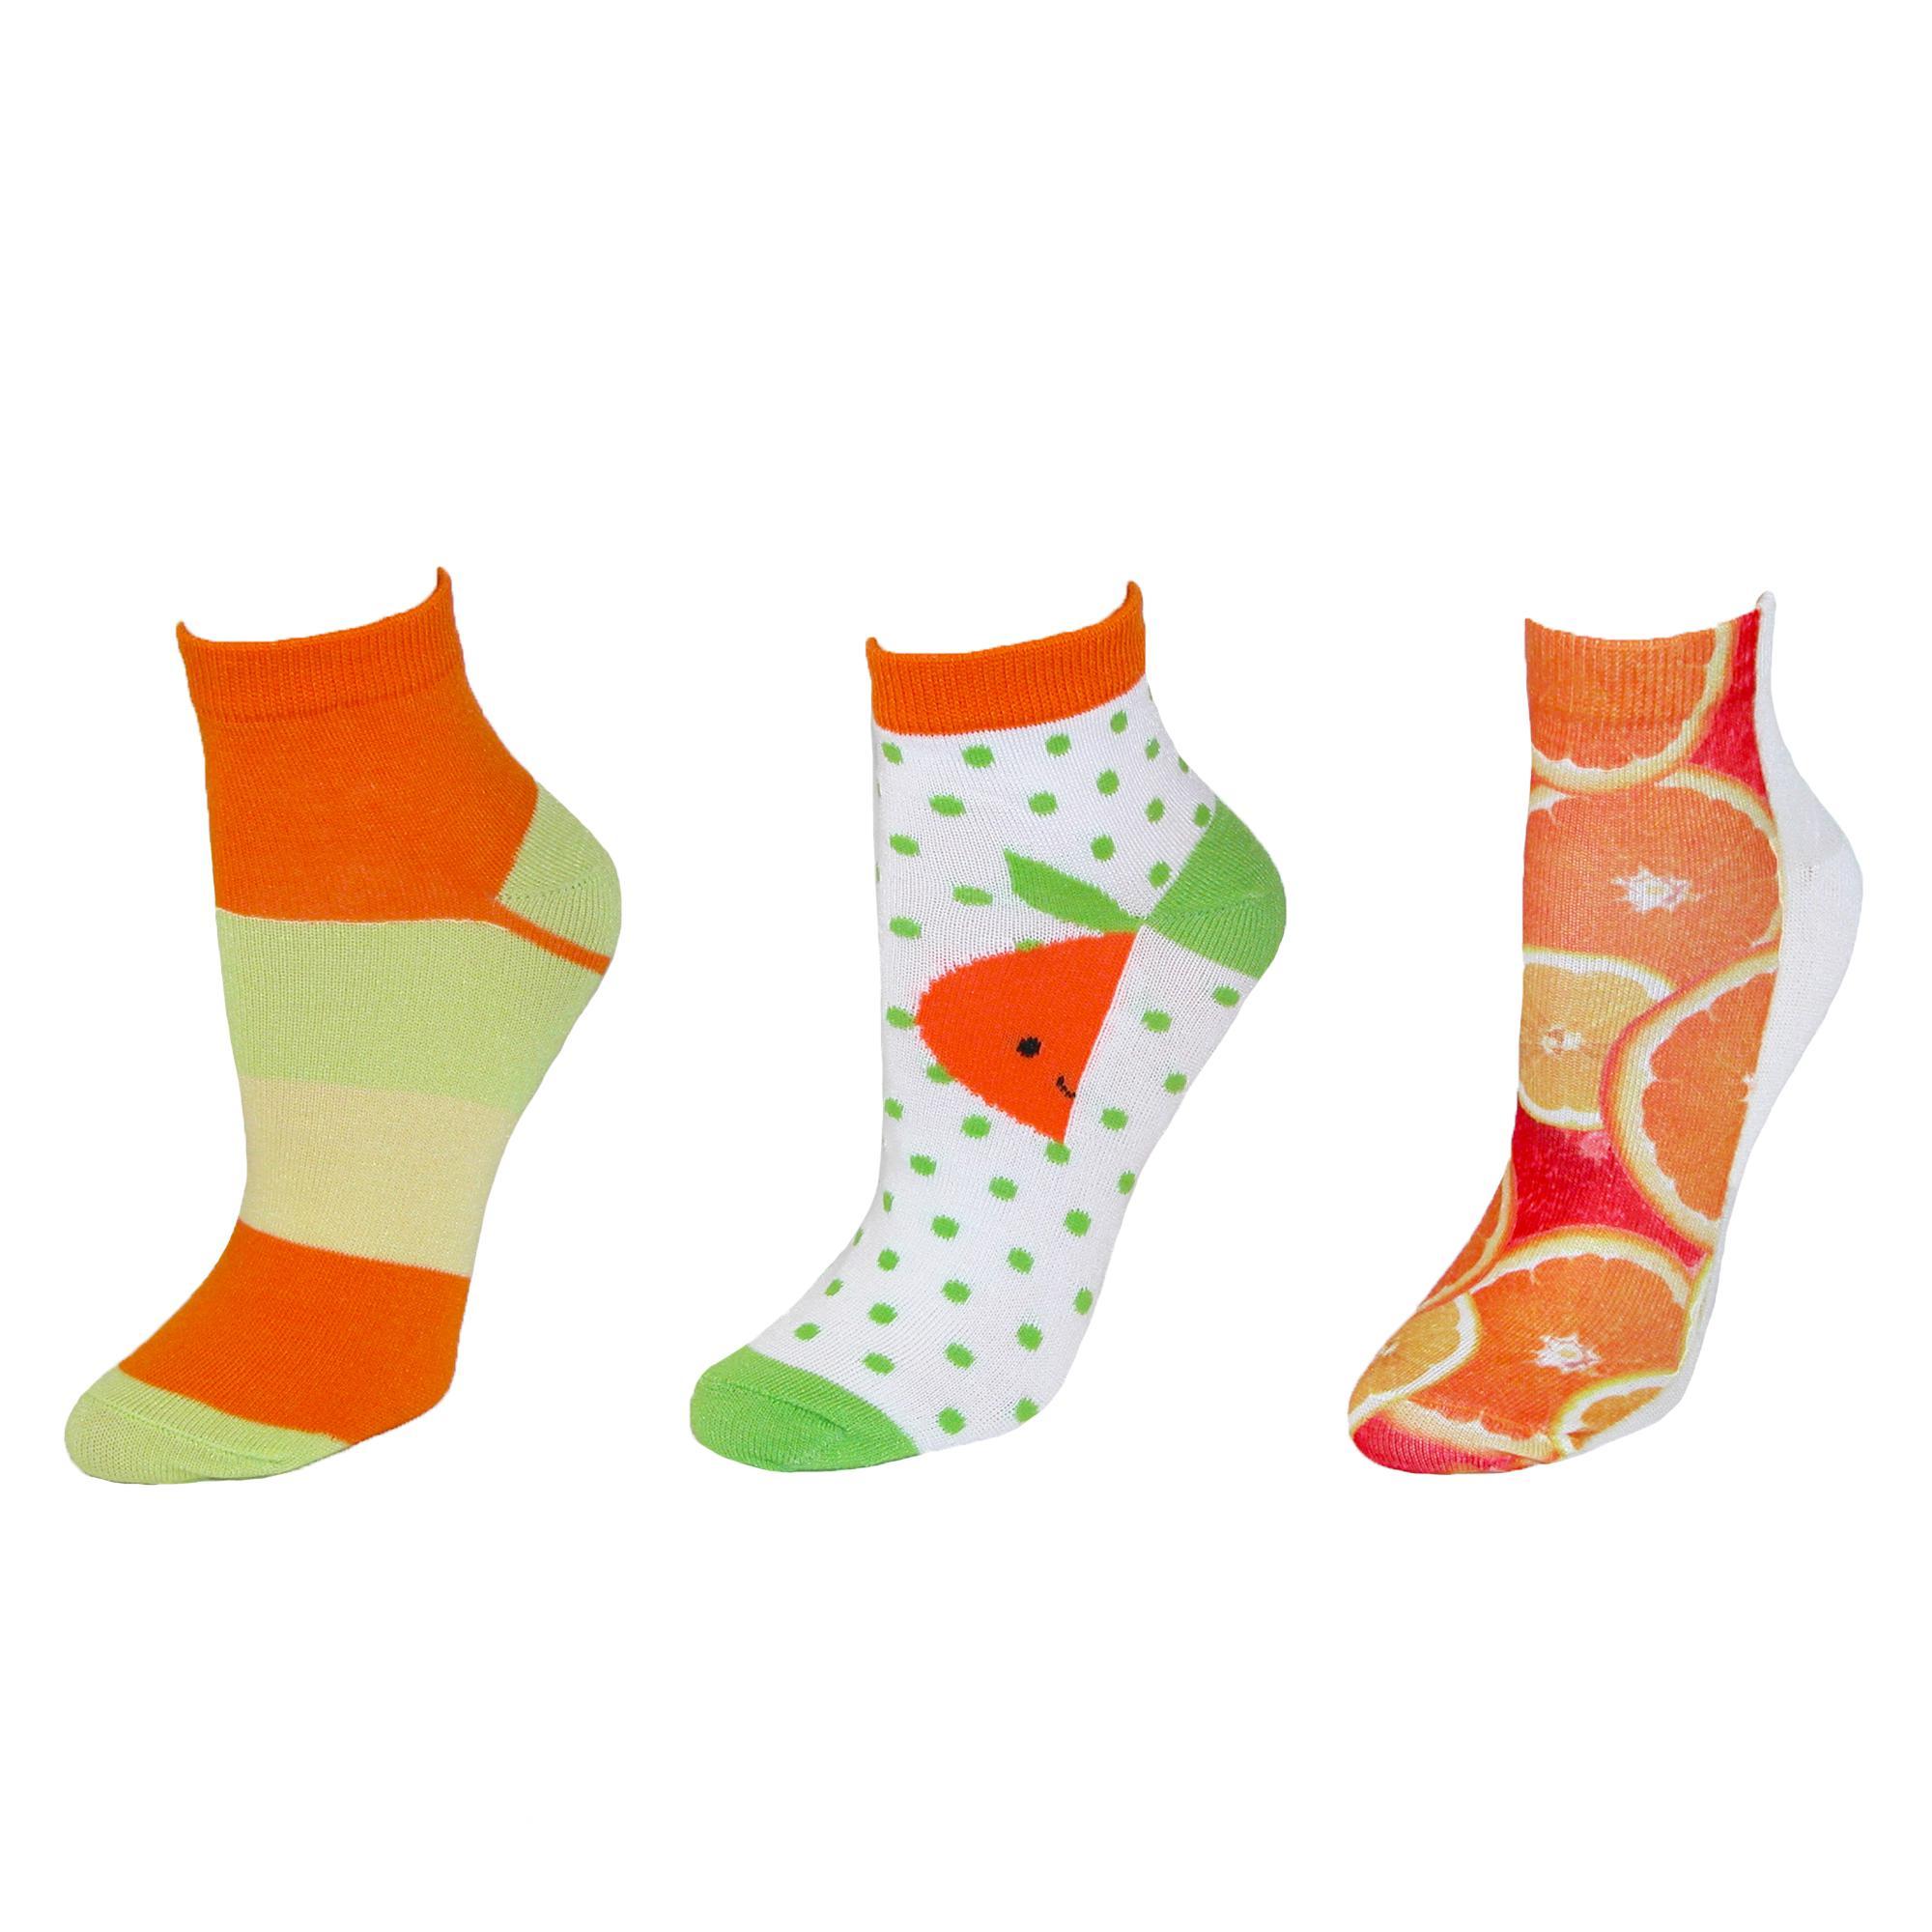 Ecko Womens Novelty Fruit Print Low Cut Socks<br /><br />Case of 3 Pair